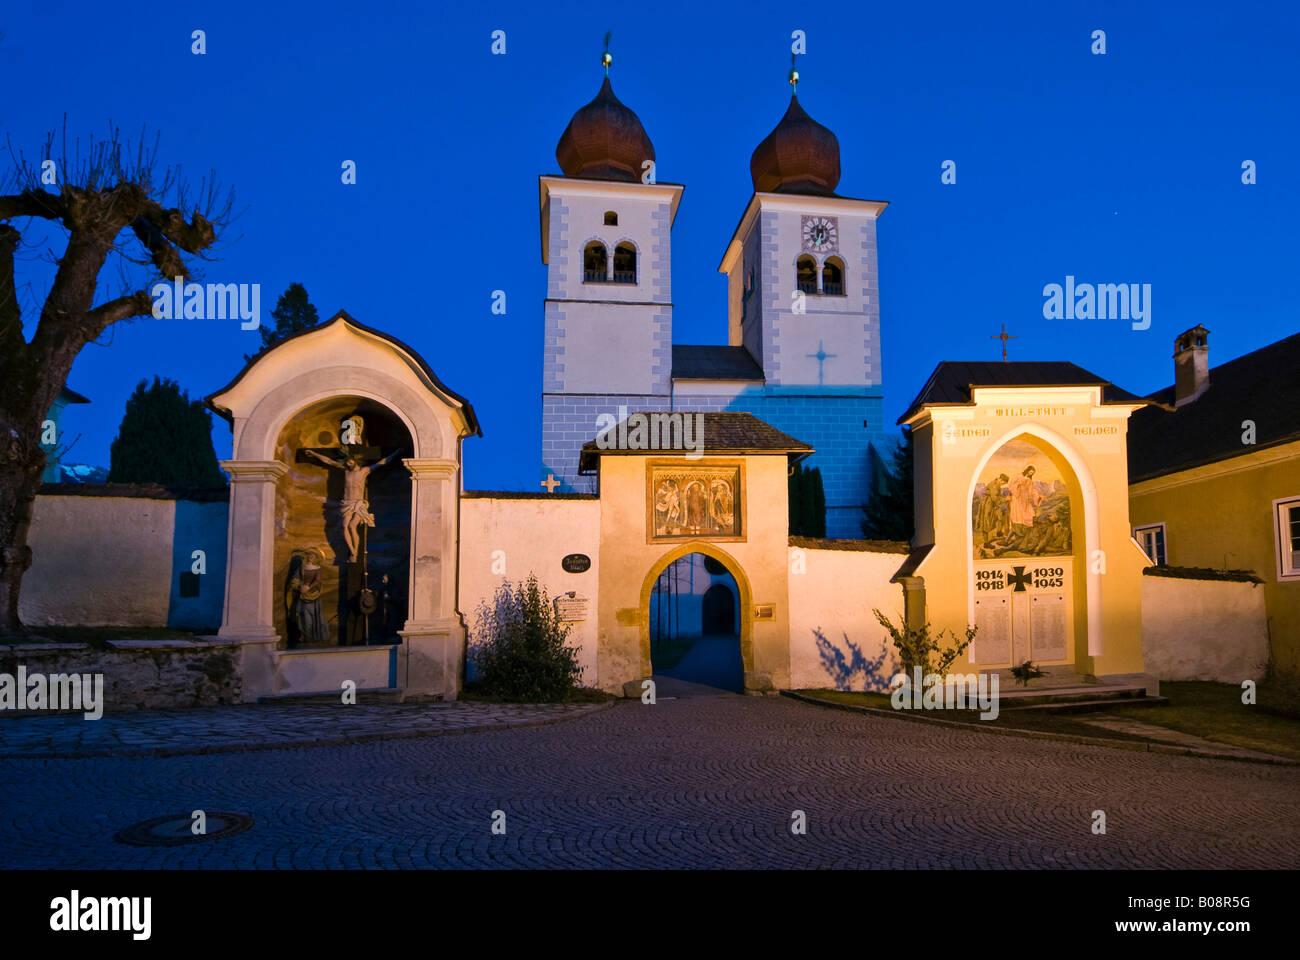 Stift Millstatt Church at night, Millstatt, Carinthia, Austria - Stock Image